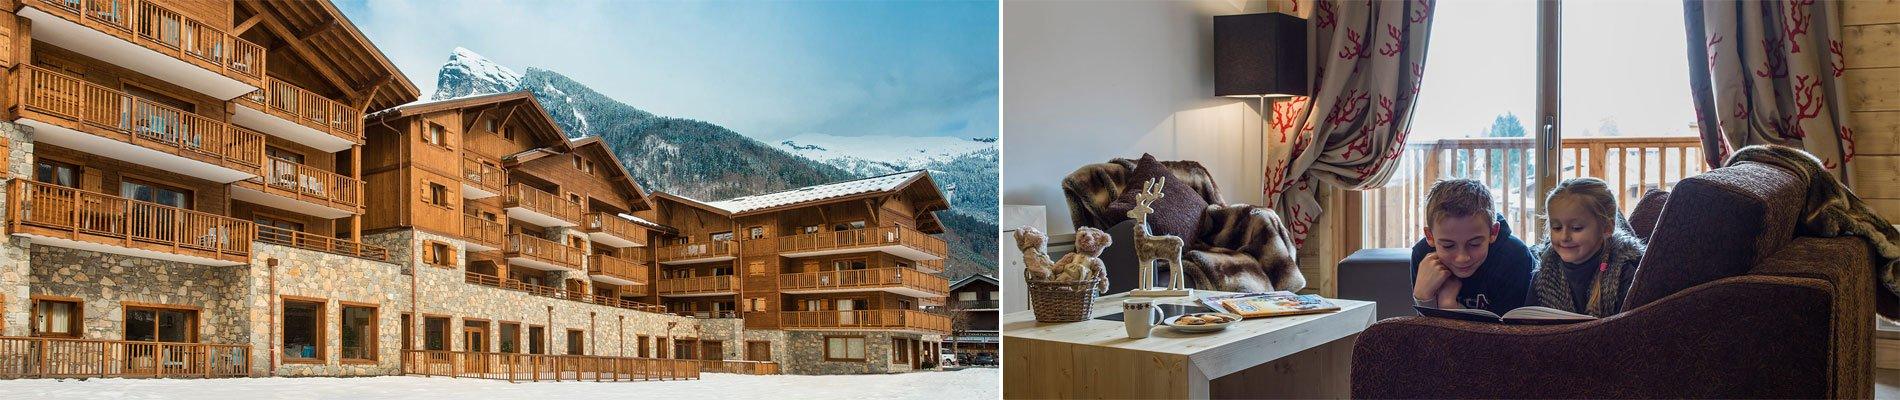 cgh-chalets-de-layssia-samoens-grand-massif-frankrijk-wintersport